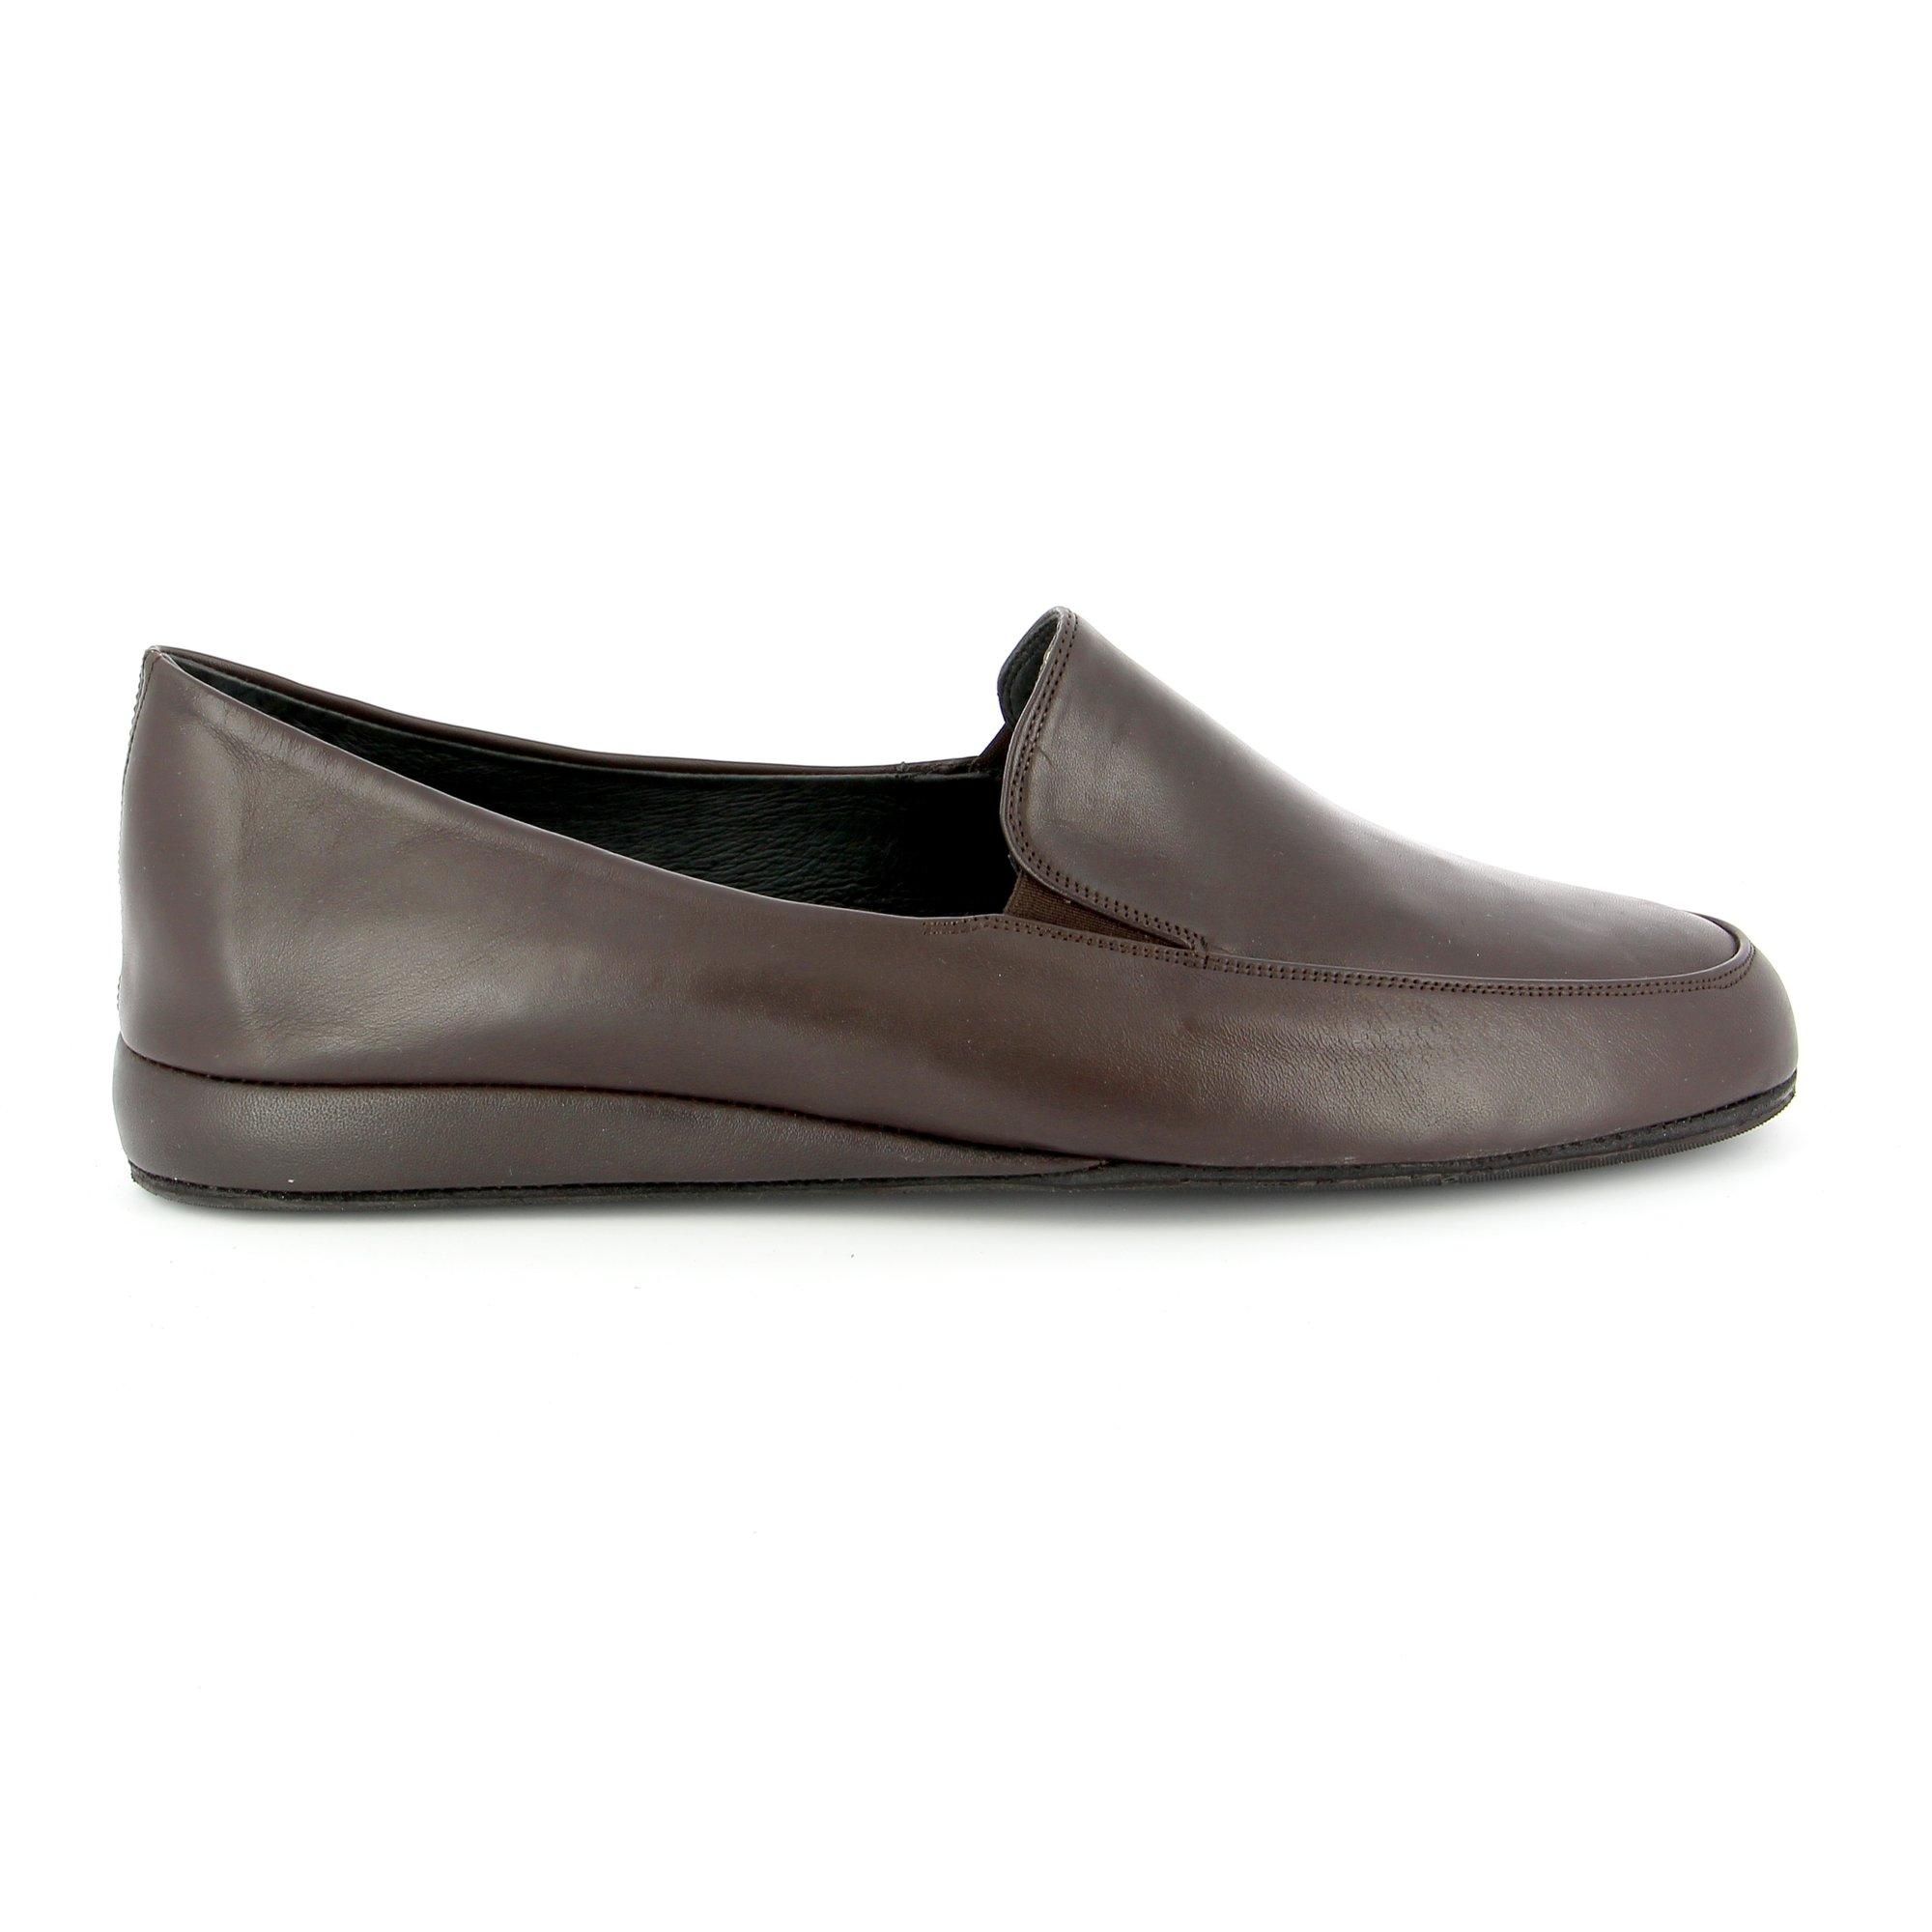 Sofacq Pantoffels bruin